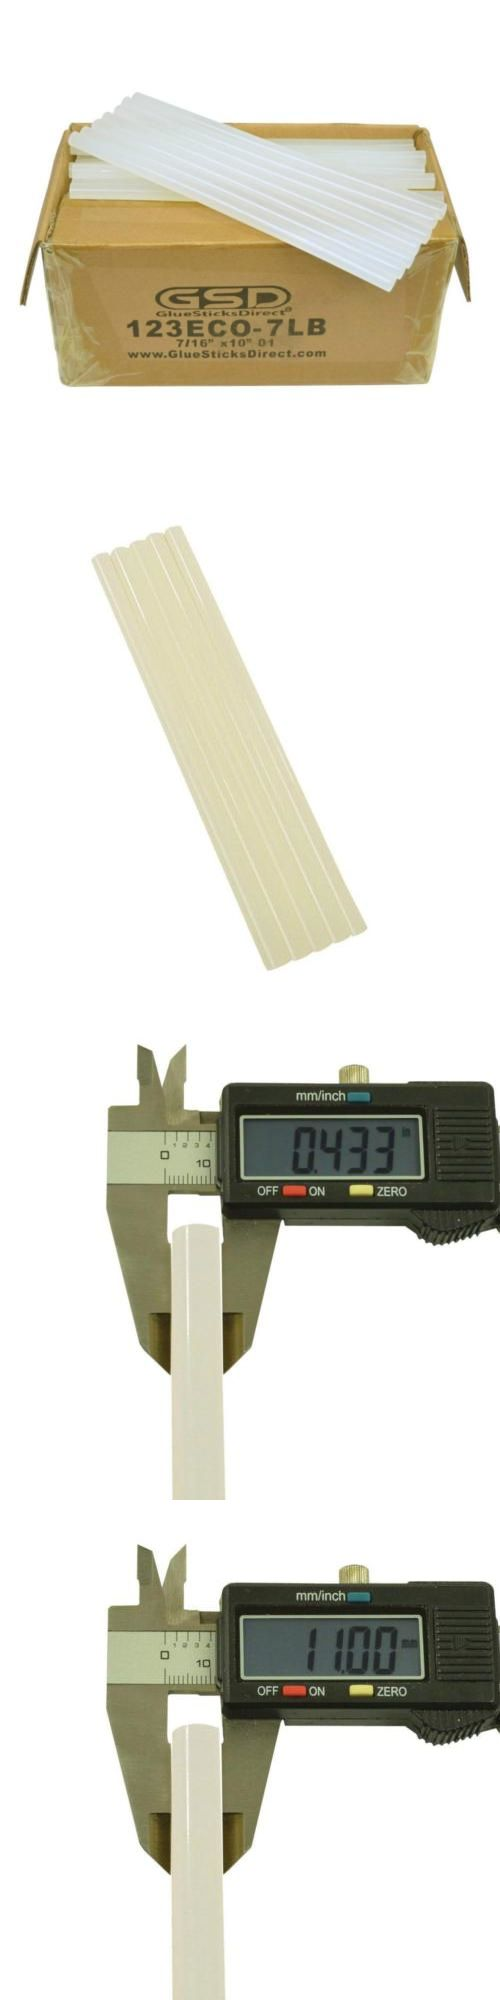 Glue Guns And Sticks 183124 Economy Hot Melt Glue Sticks 7 16 X 10 125 7 Lbs Bulk Buy It Now Only 43 09 On Ebay Sticks Economy Glue Sticks Stick